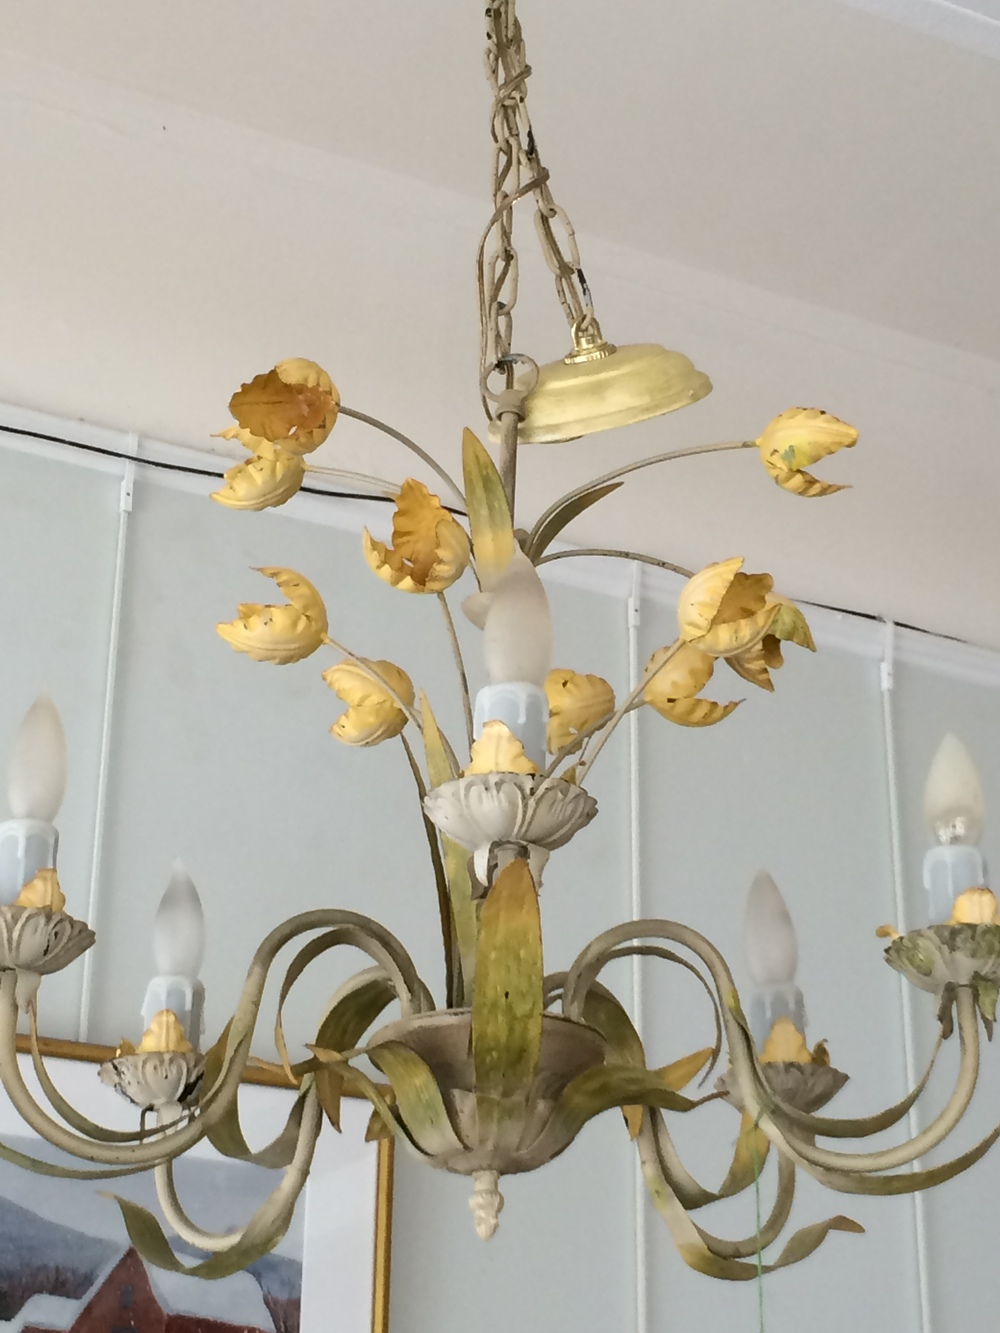 Vintage Italian tulip chandelier